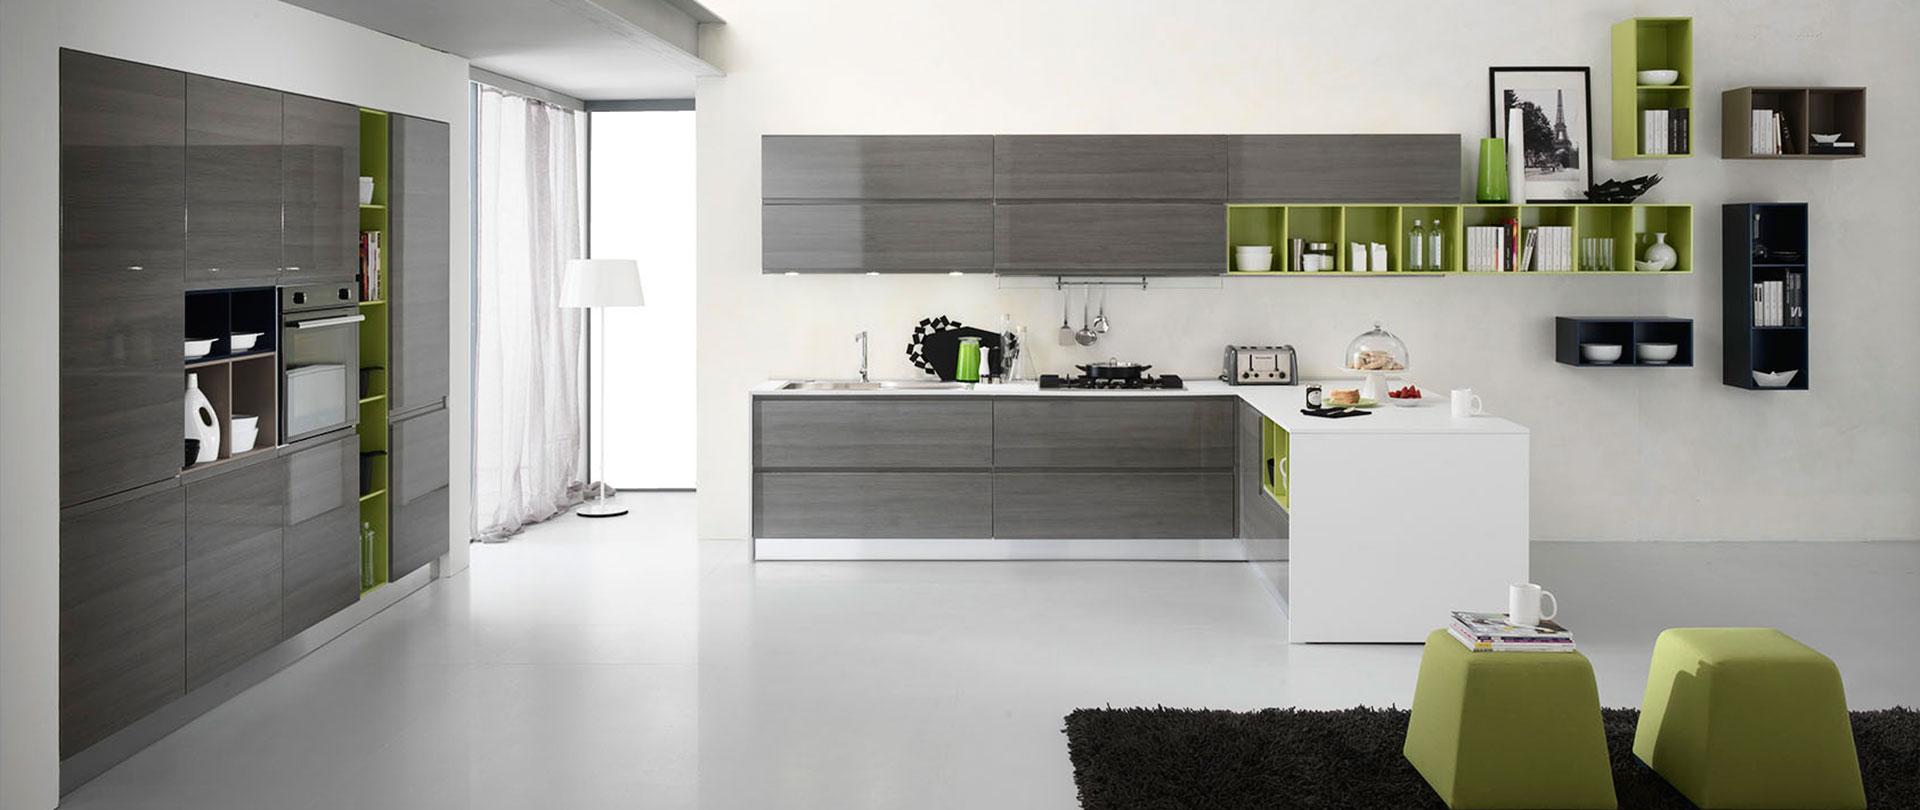 Cucine Moderne - Cucinissima